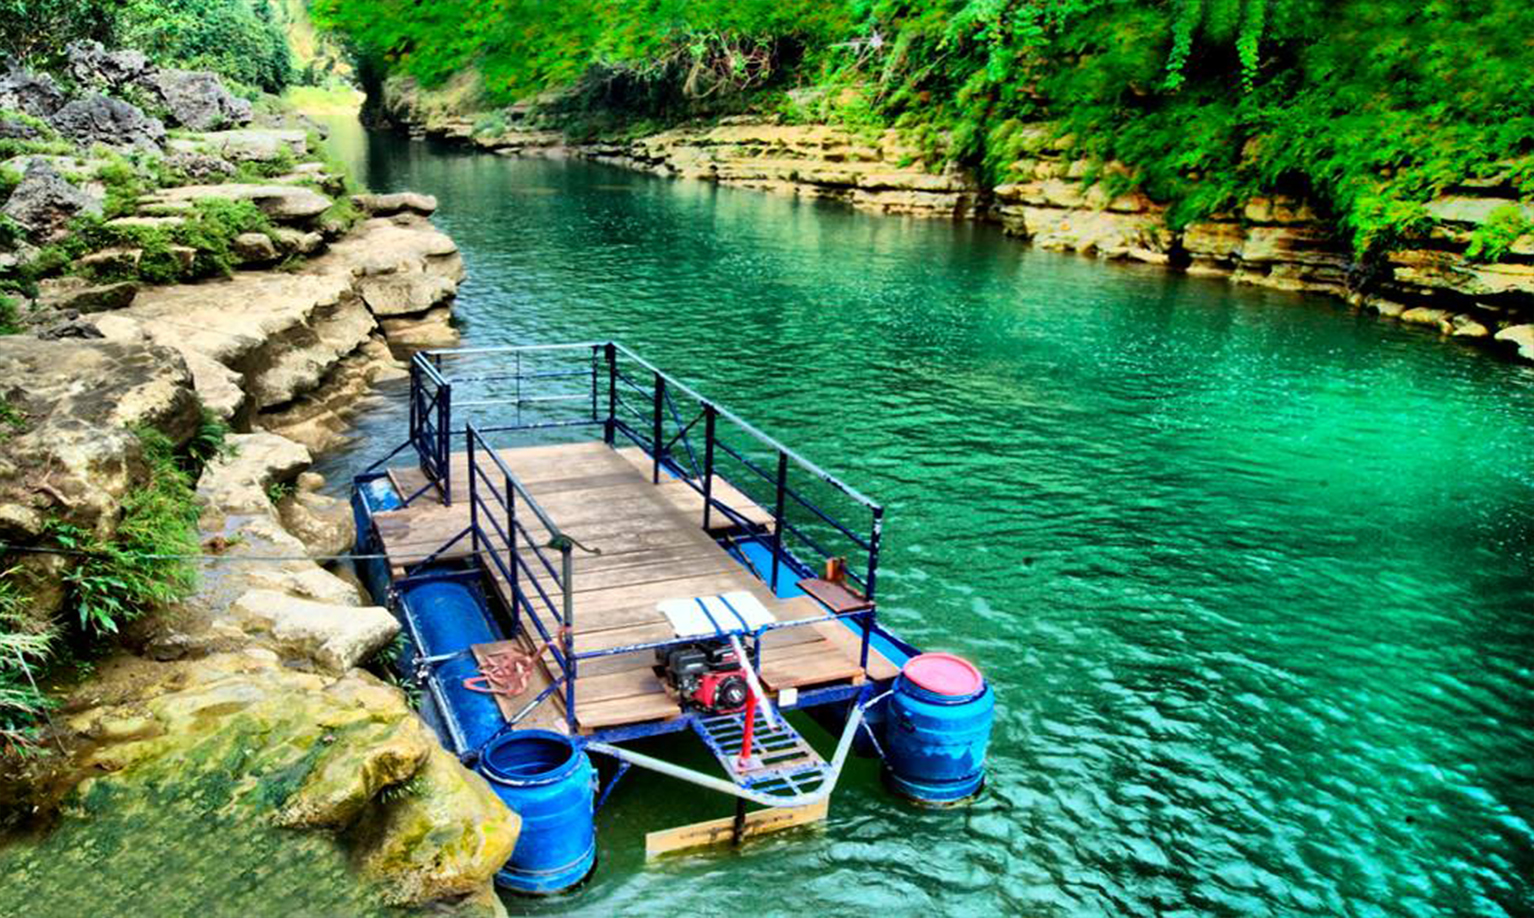 30 Tempat Wisata Terindah Wajib Kunjungi Jogja 2018 Tegalarum Adventure